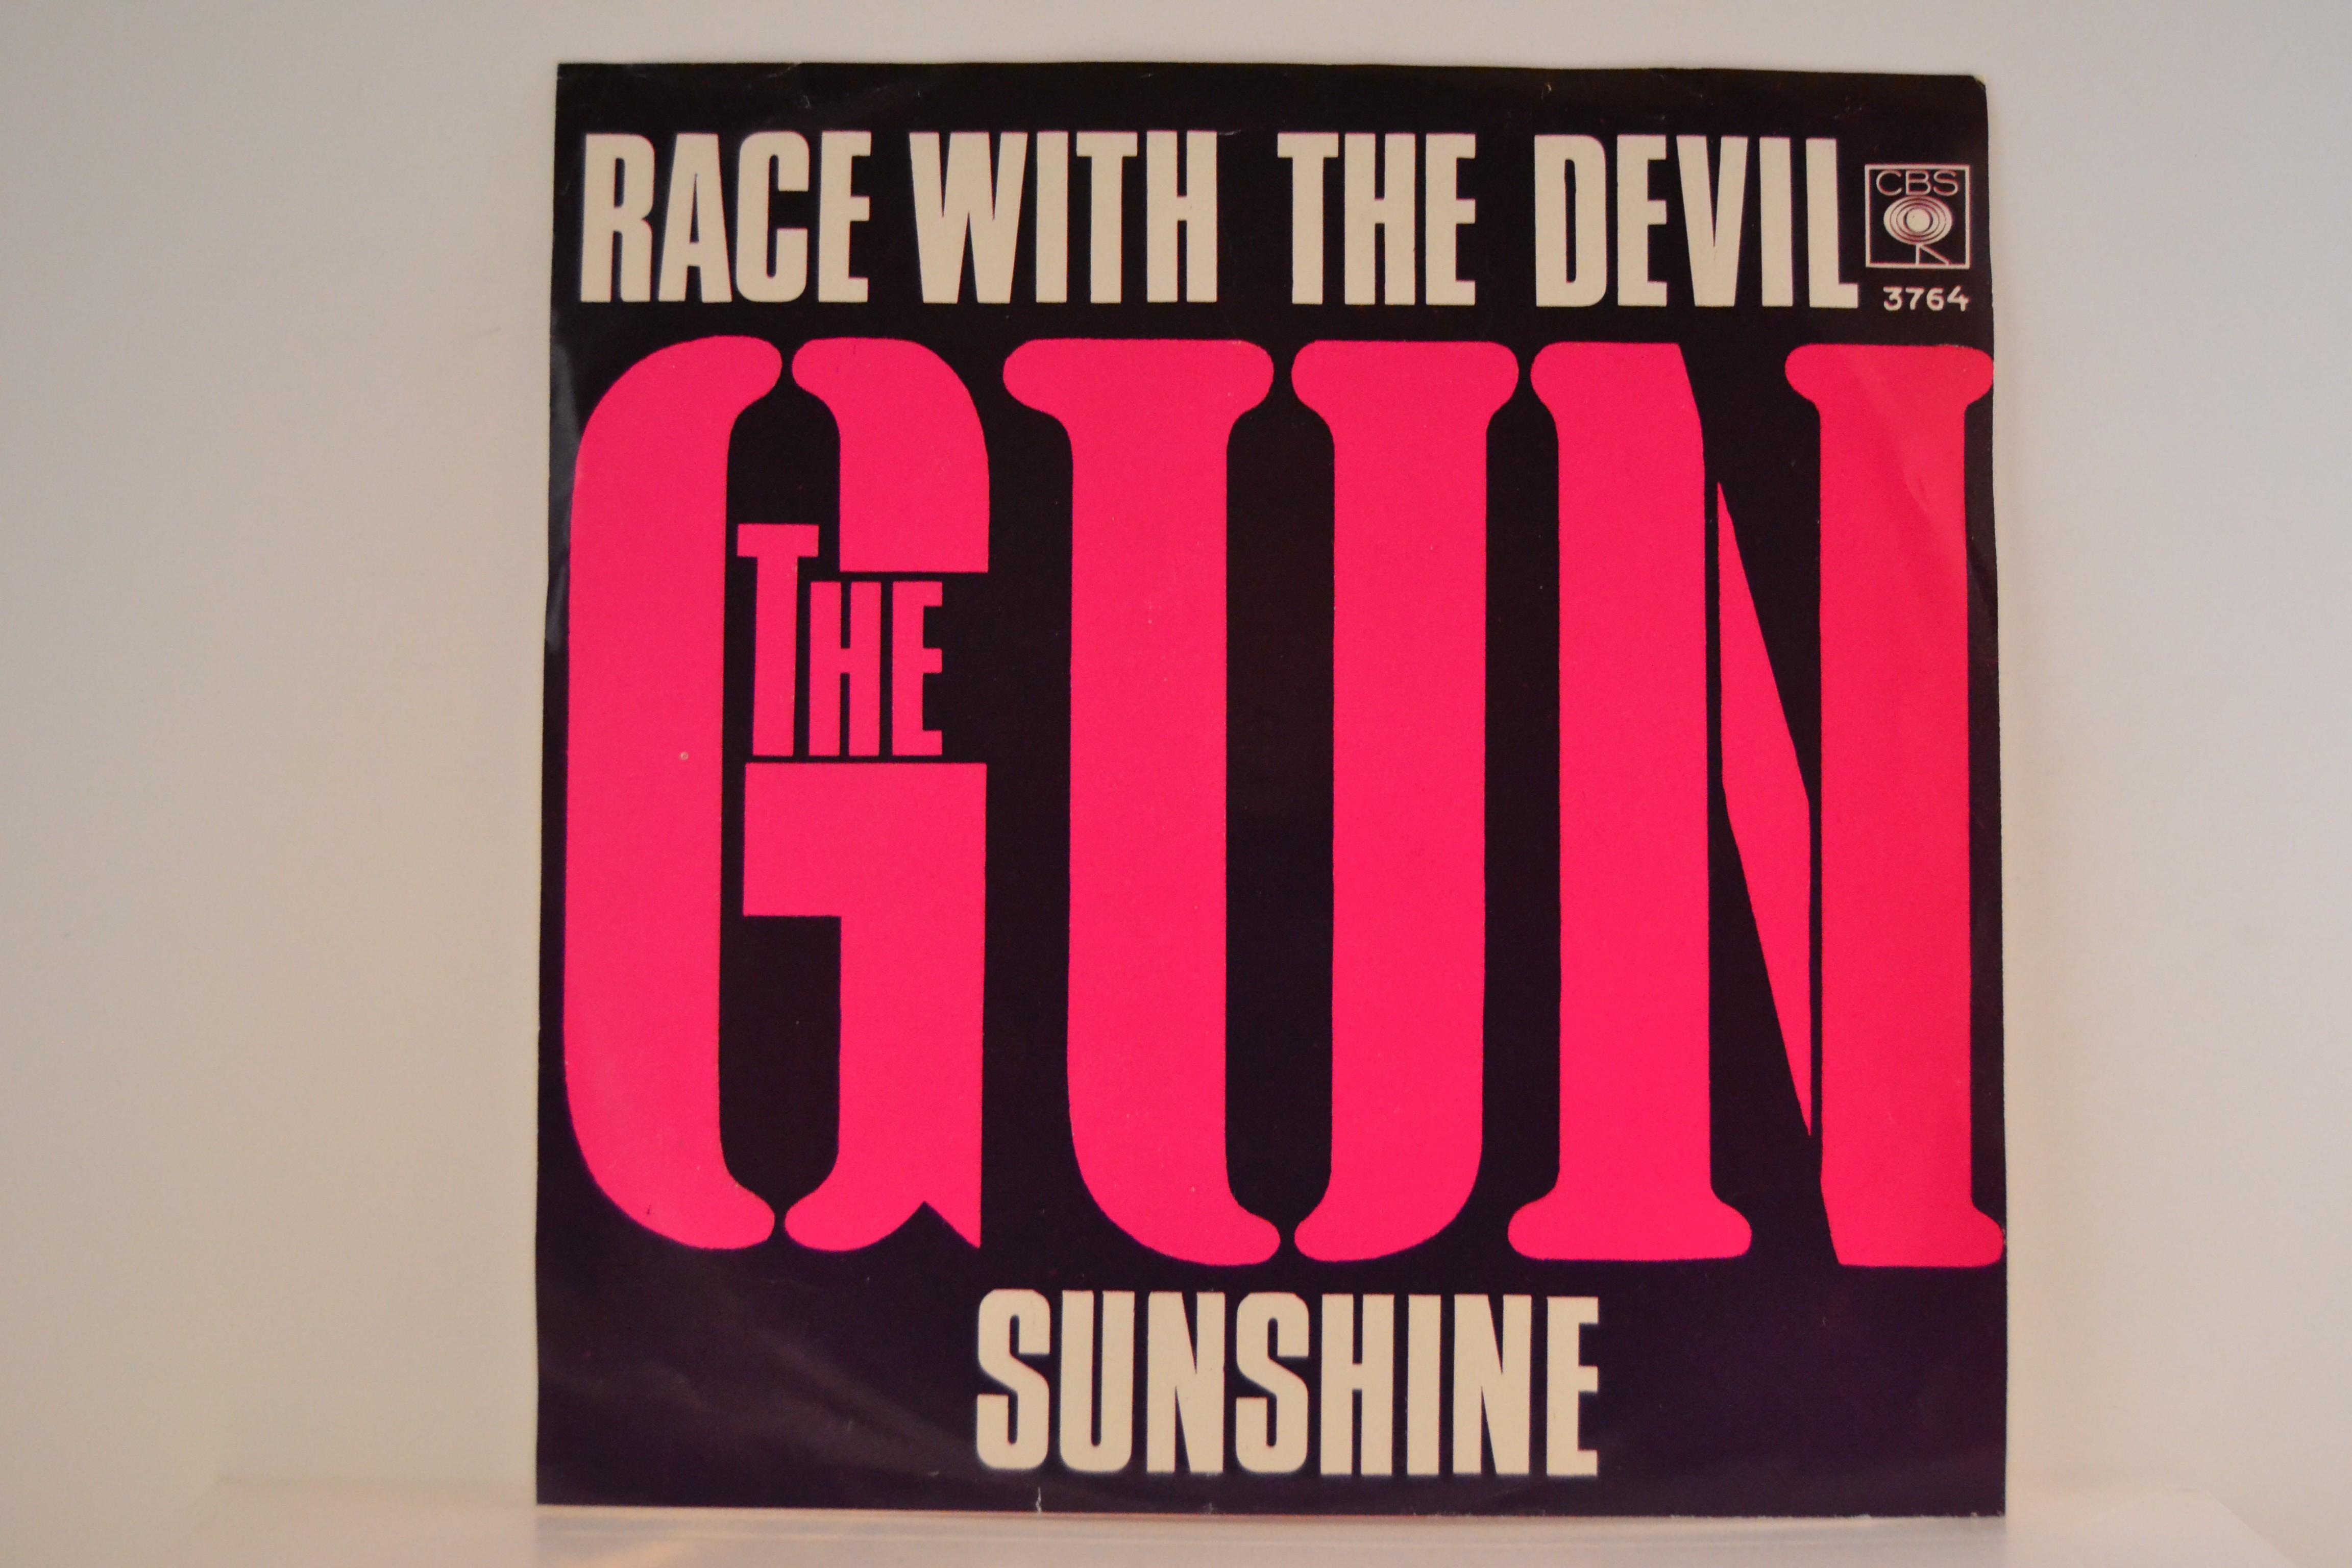 GUN : Race with the devil / Sunshine